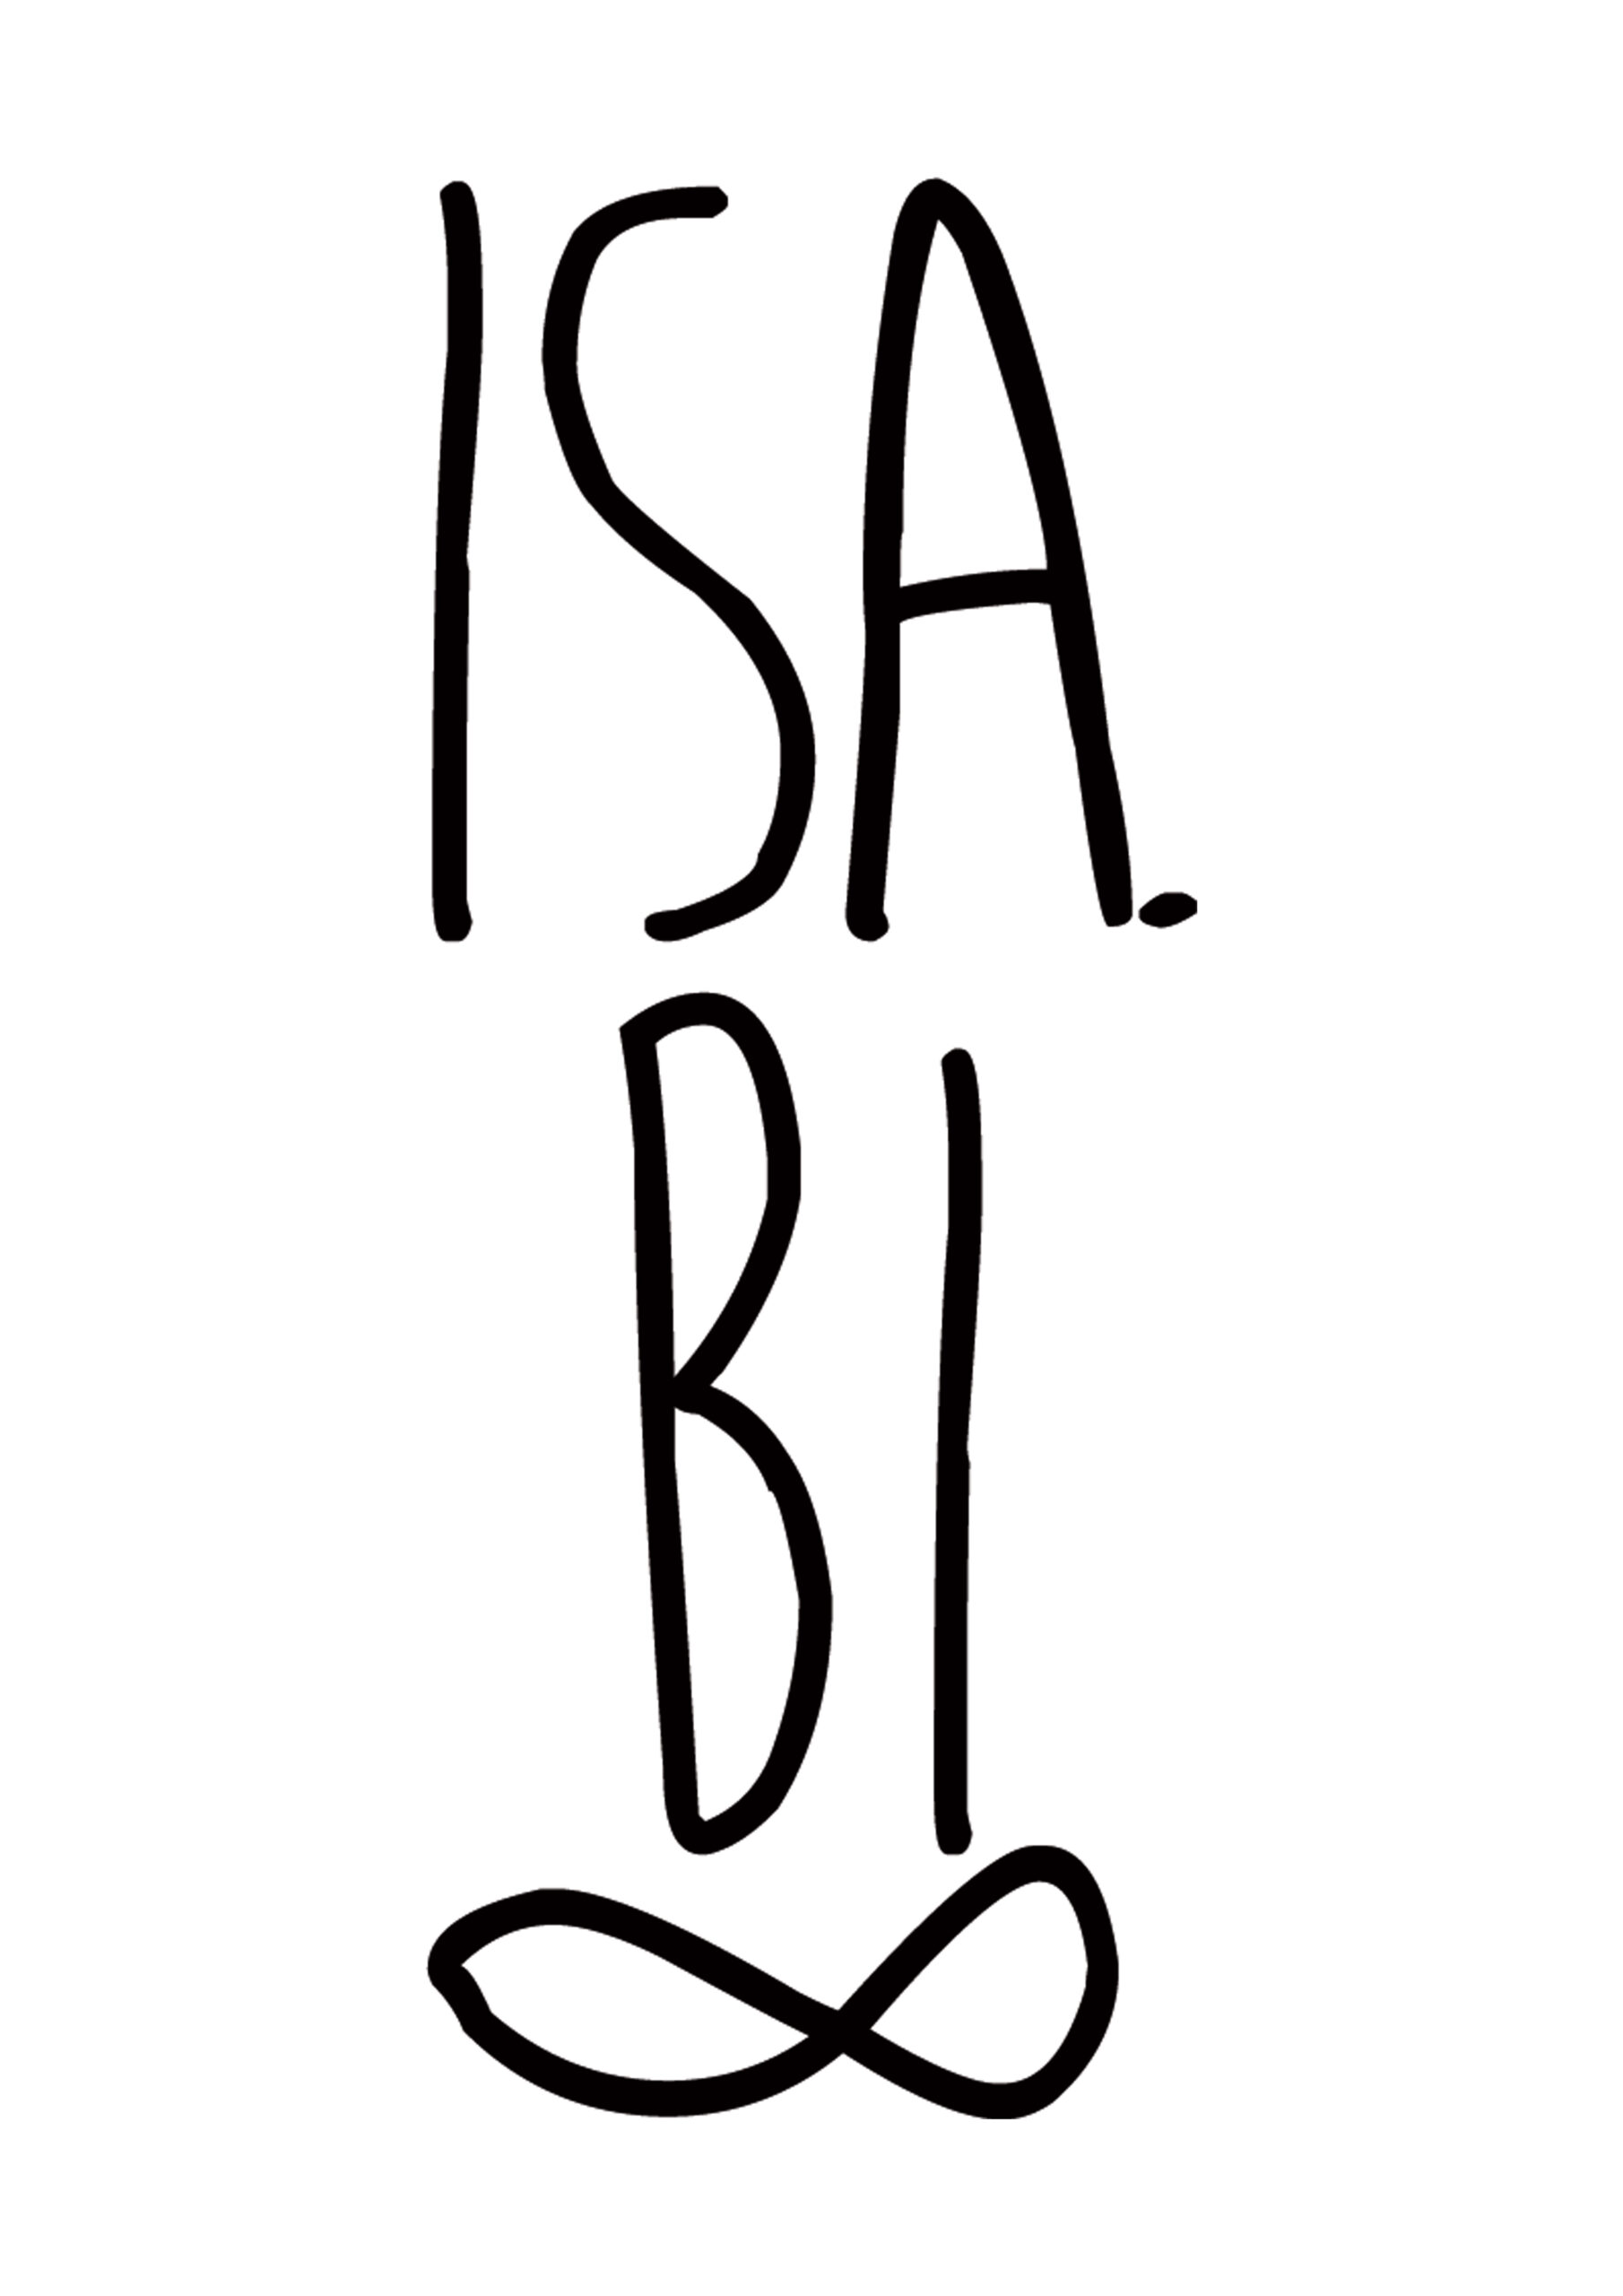 isabella bersellini